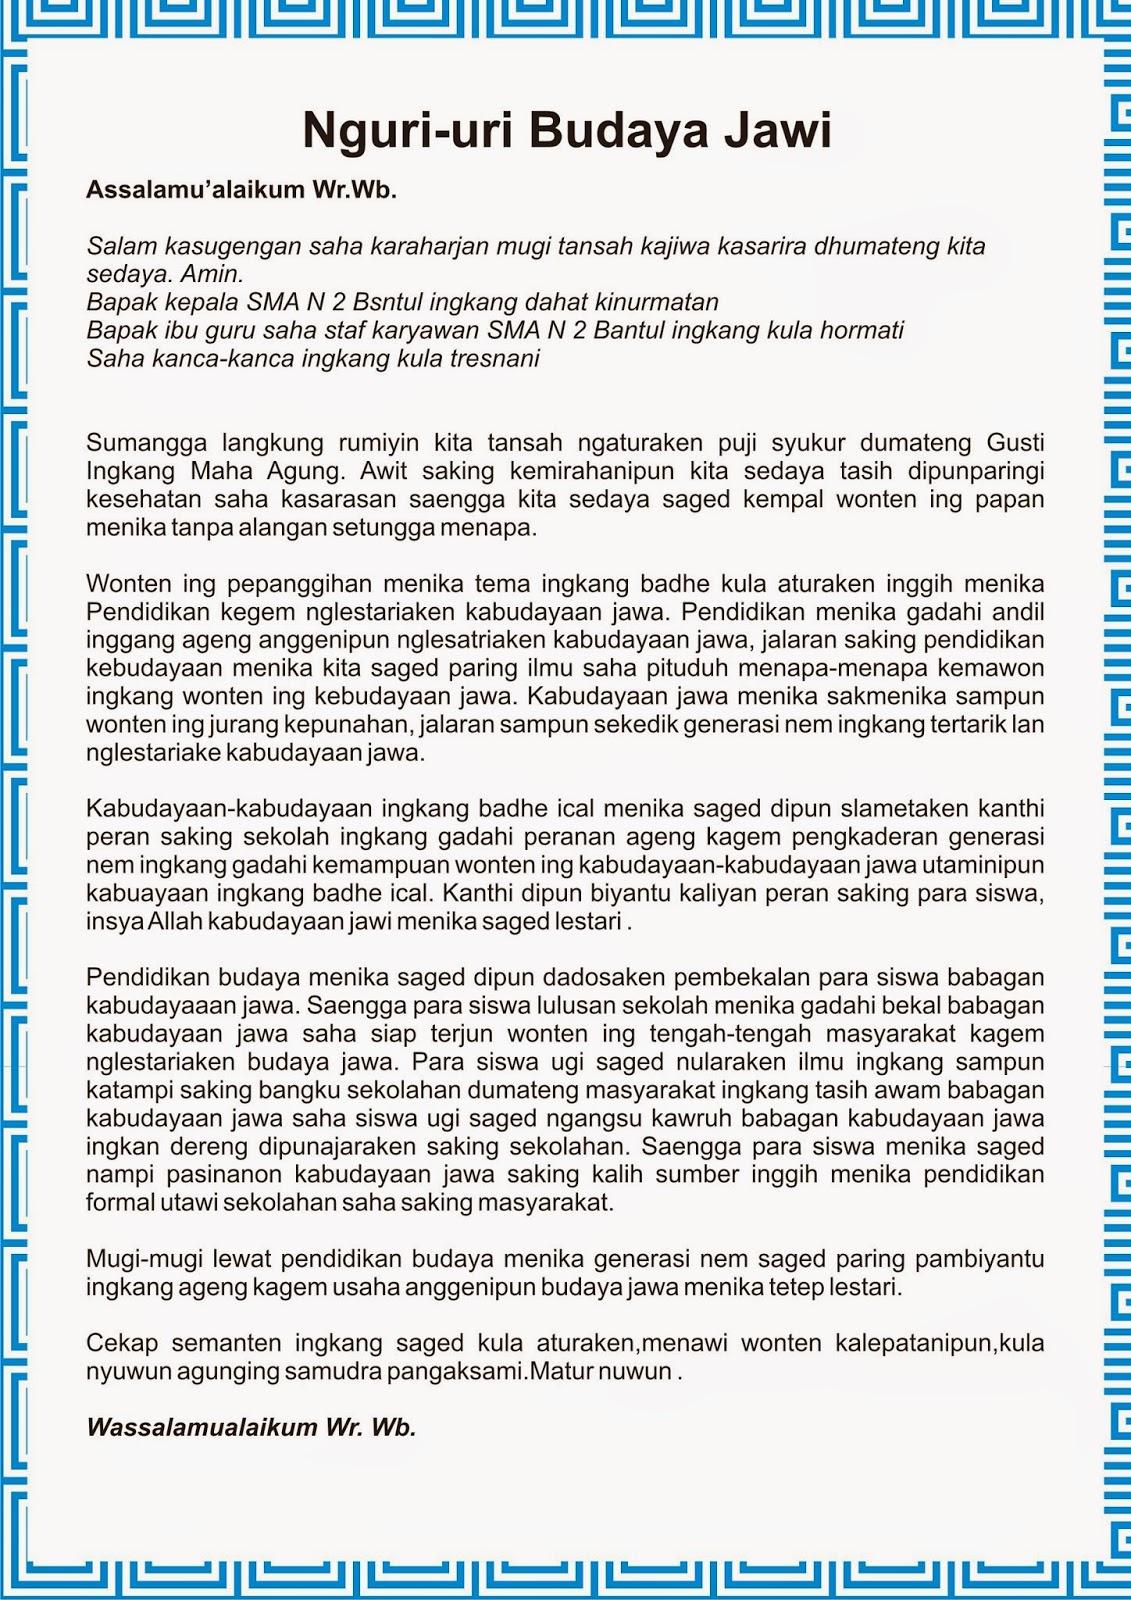 Koleksi Dp Bbm Lucu Bahasa Jawa Serang Kocak Dan Gokil Dp Bbm Lucu